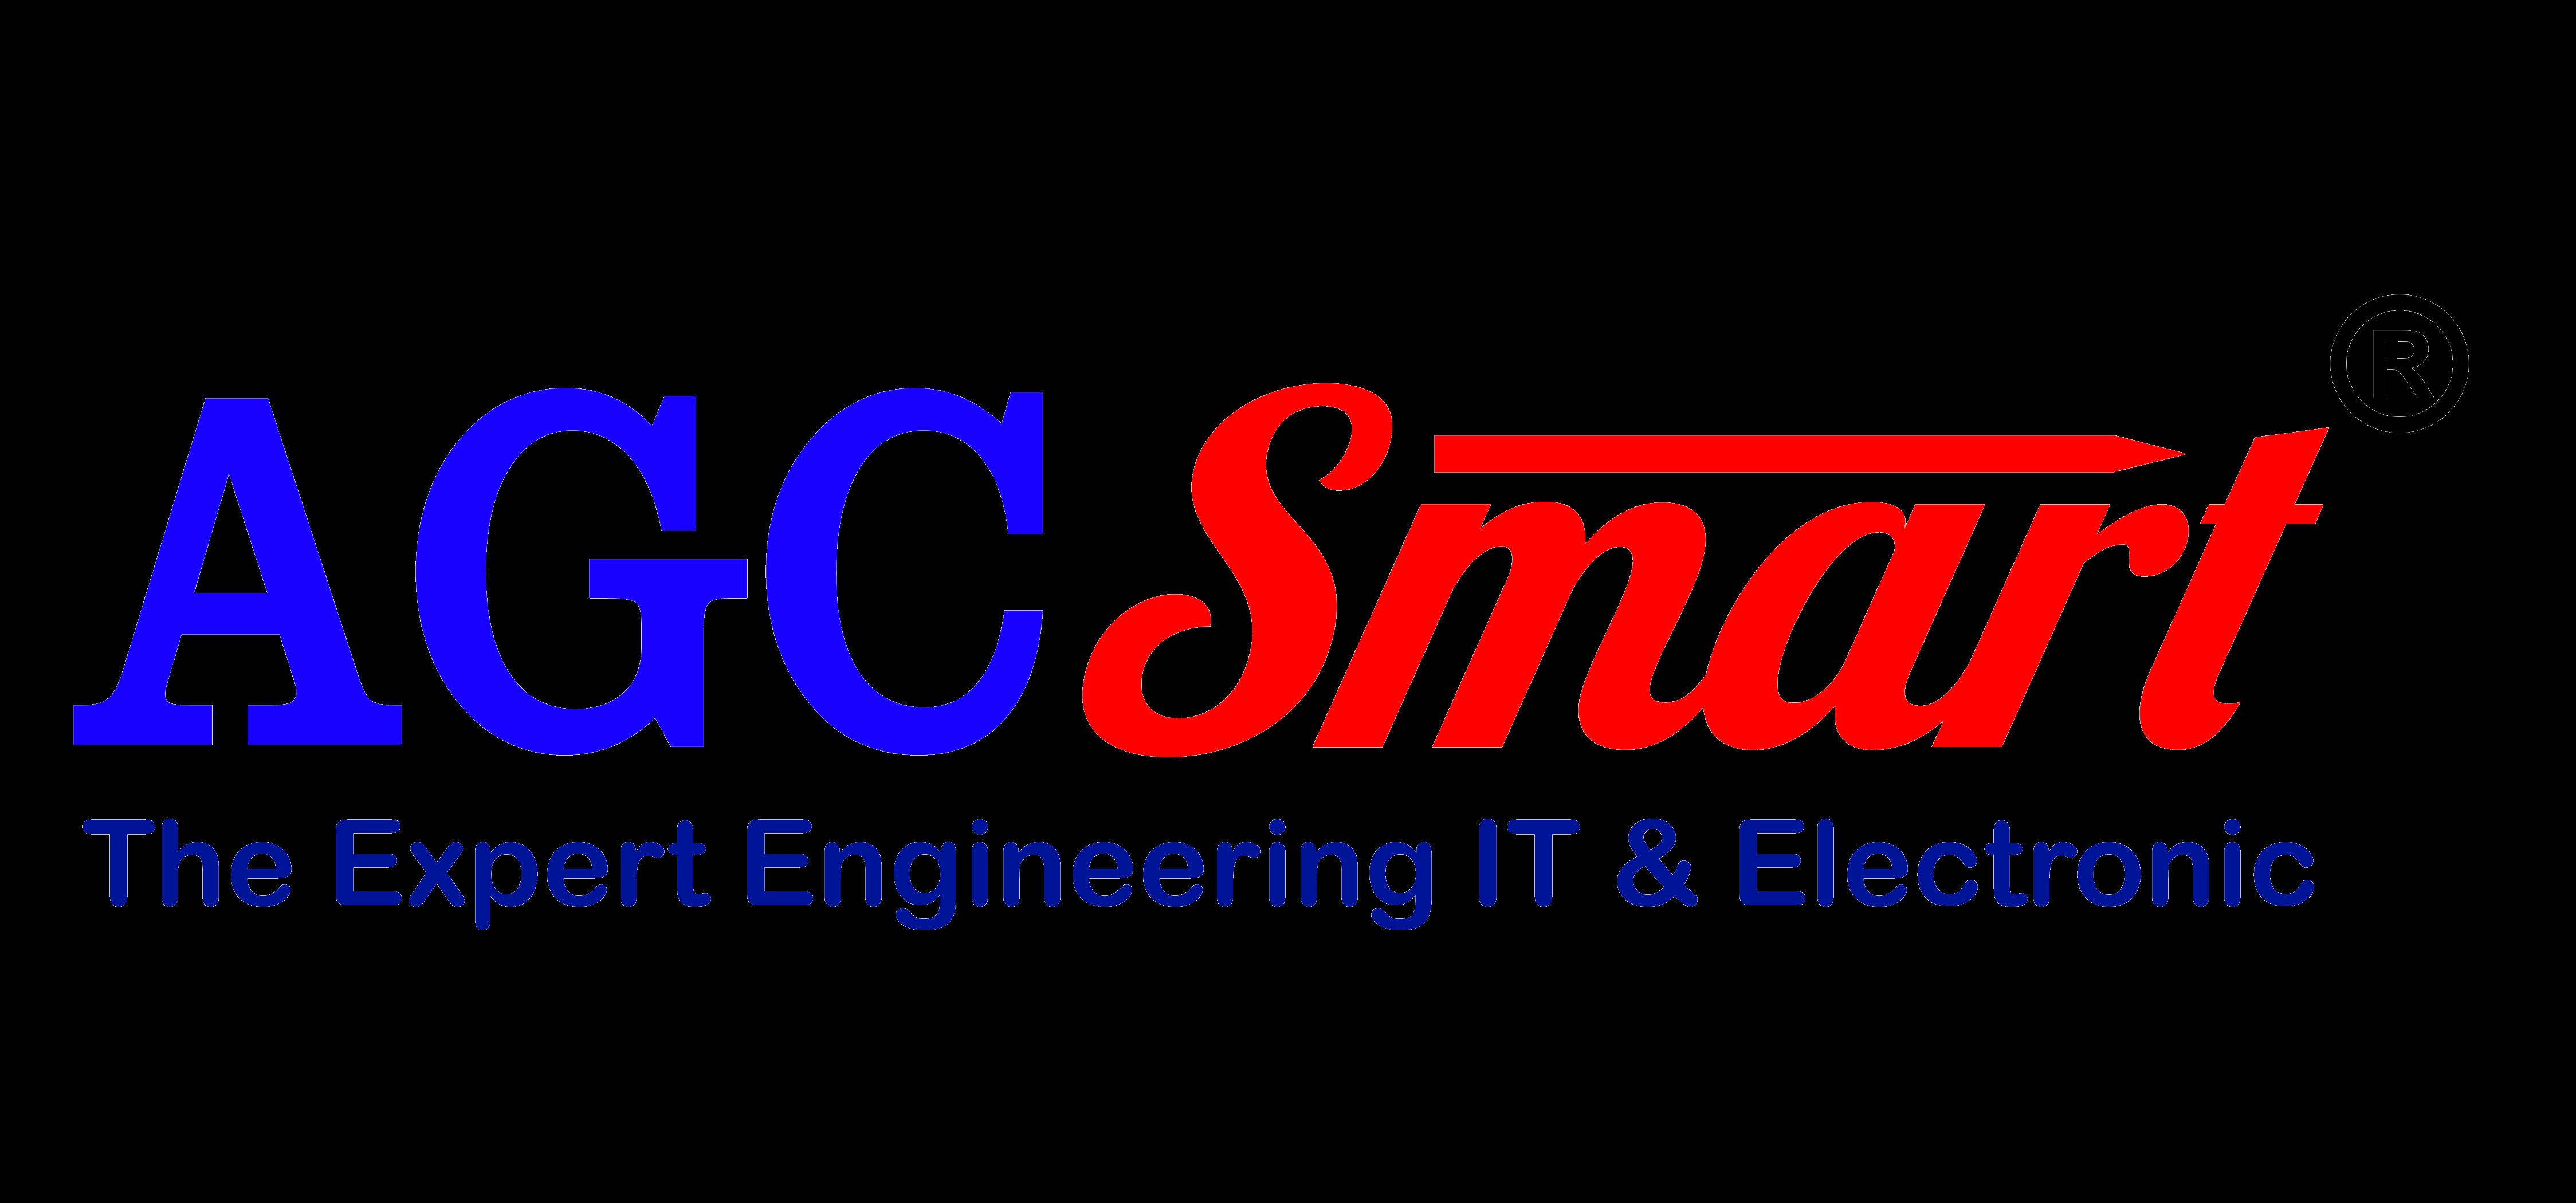 cropped-logo-agcsmart-1.png